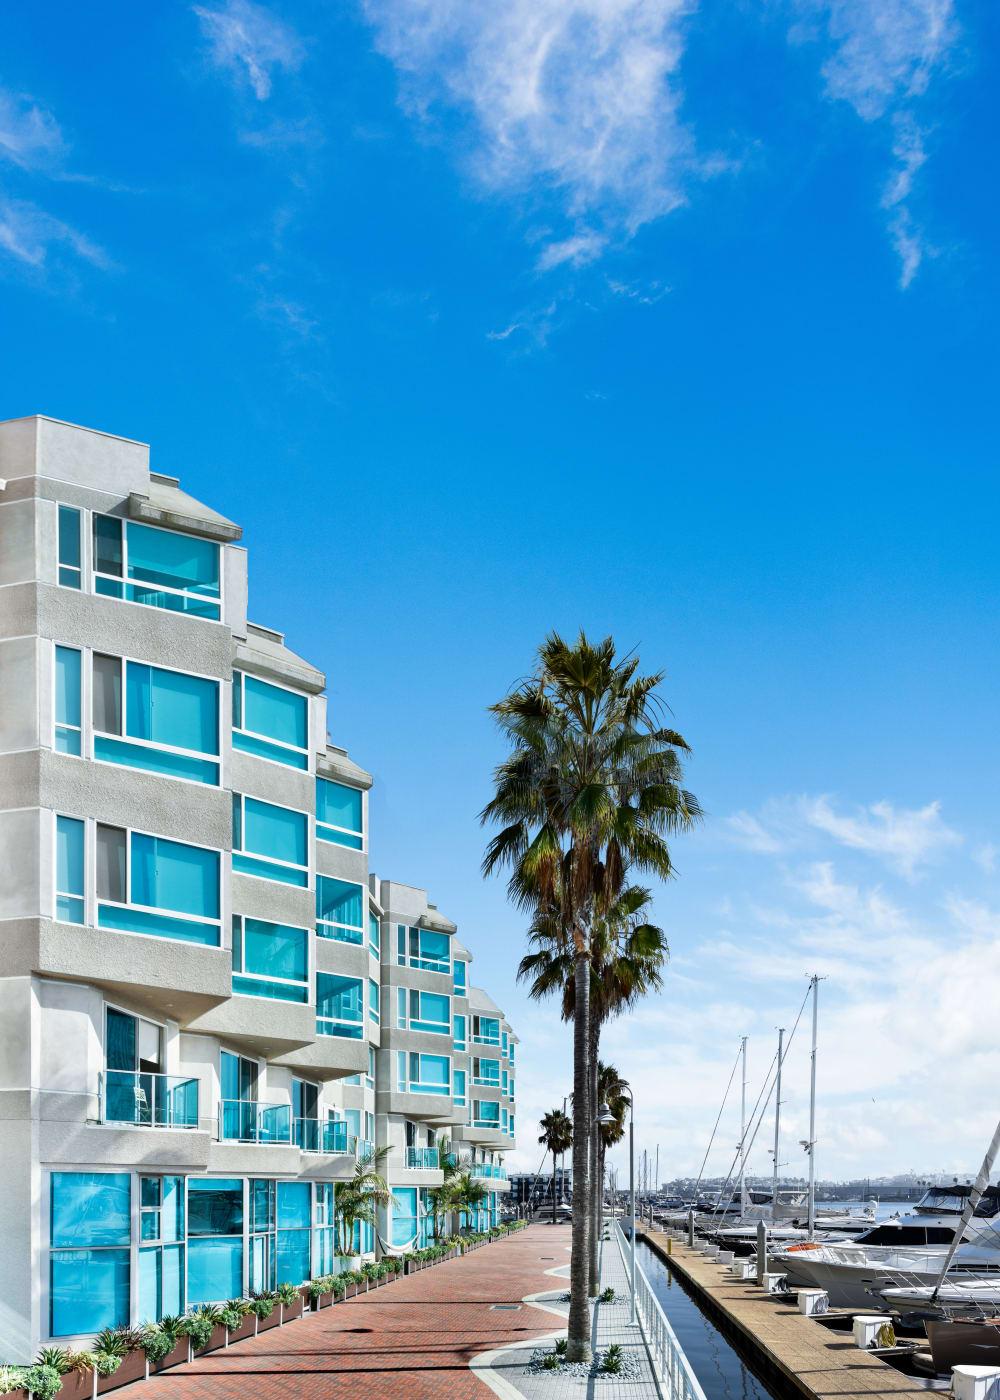 Luxury apartments at Esprit Marina del Rey in Marina del Rey, California